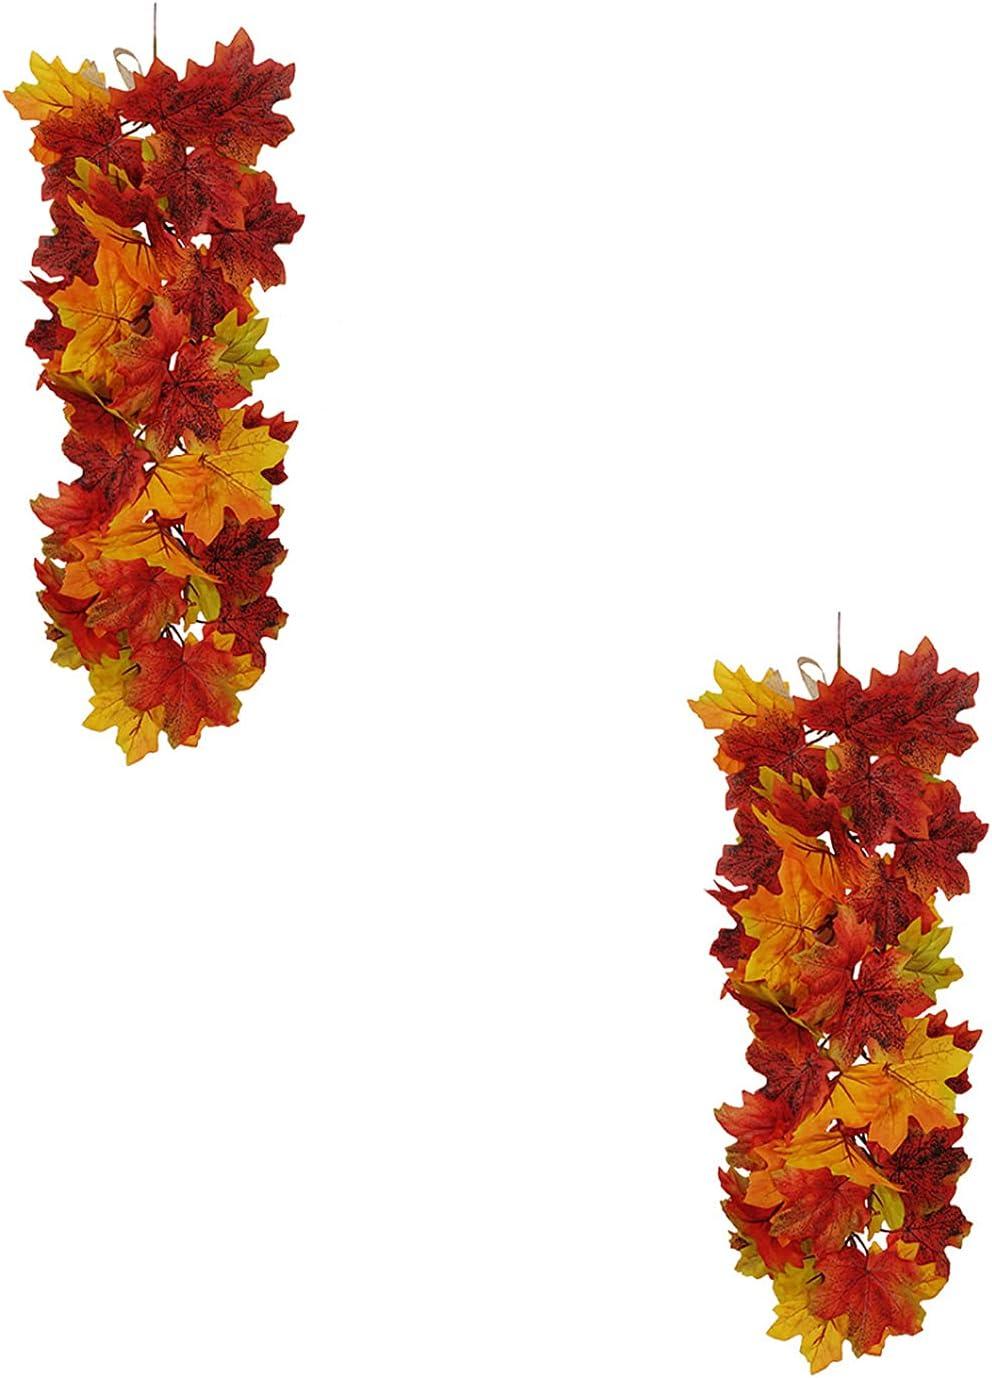 Brand new RIABXZ 2pcs Fall Super intense SALE Maple Leaf Hanging Garland Vine Artif